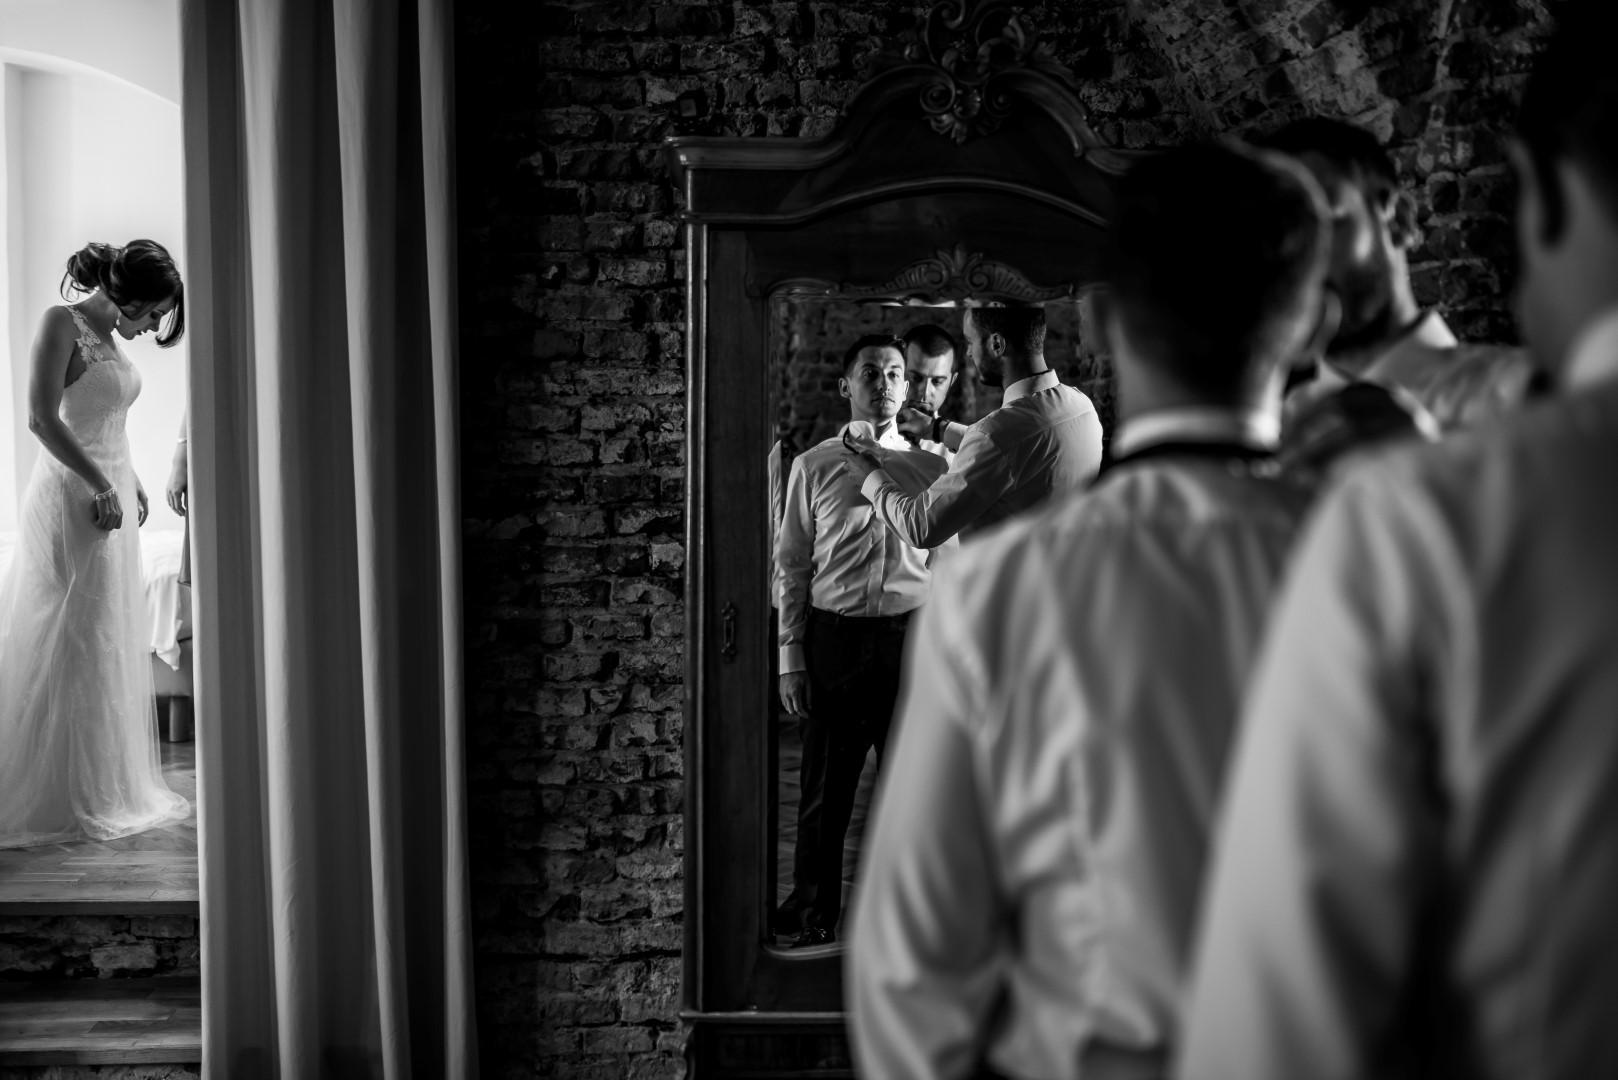 da studio fotografi de nunta cluj Dana & Alex by DA studio-99 (2) (Large)